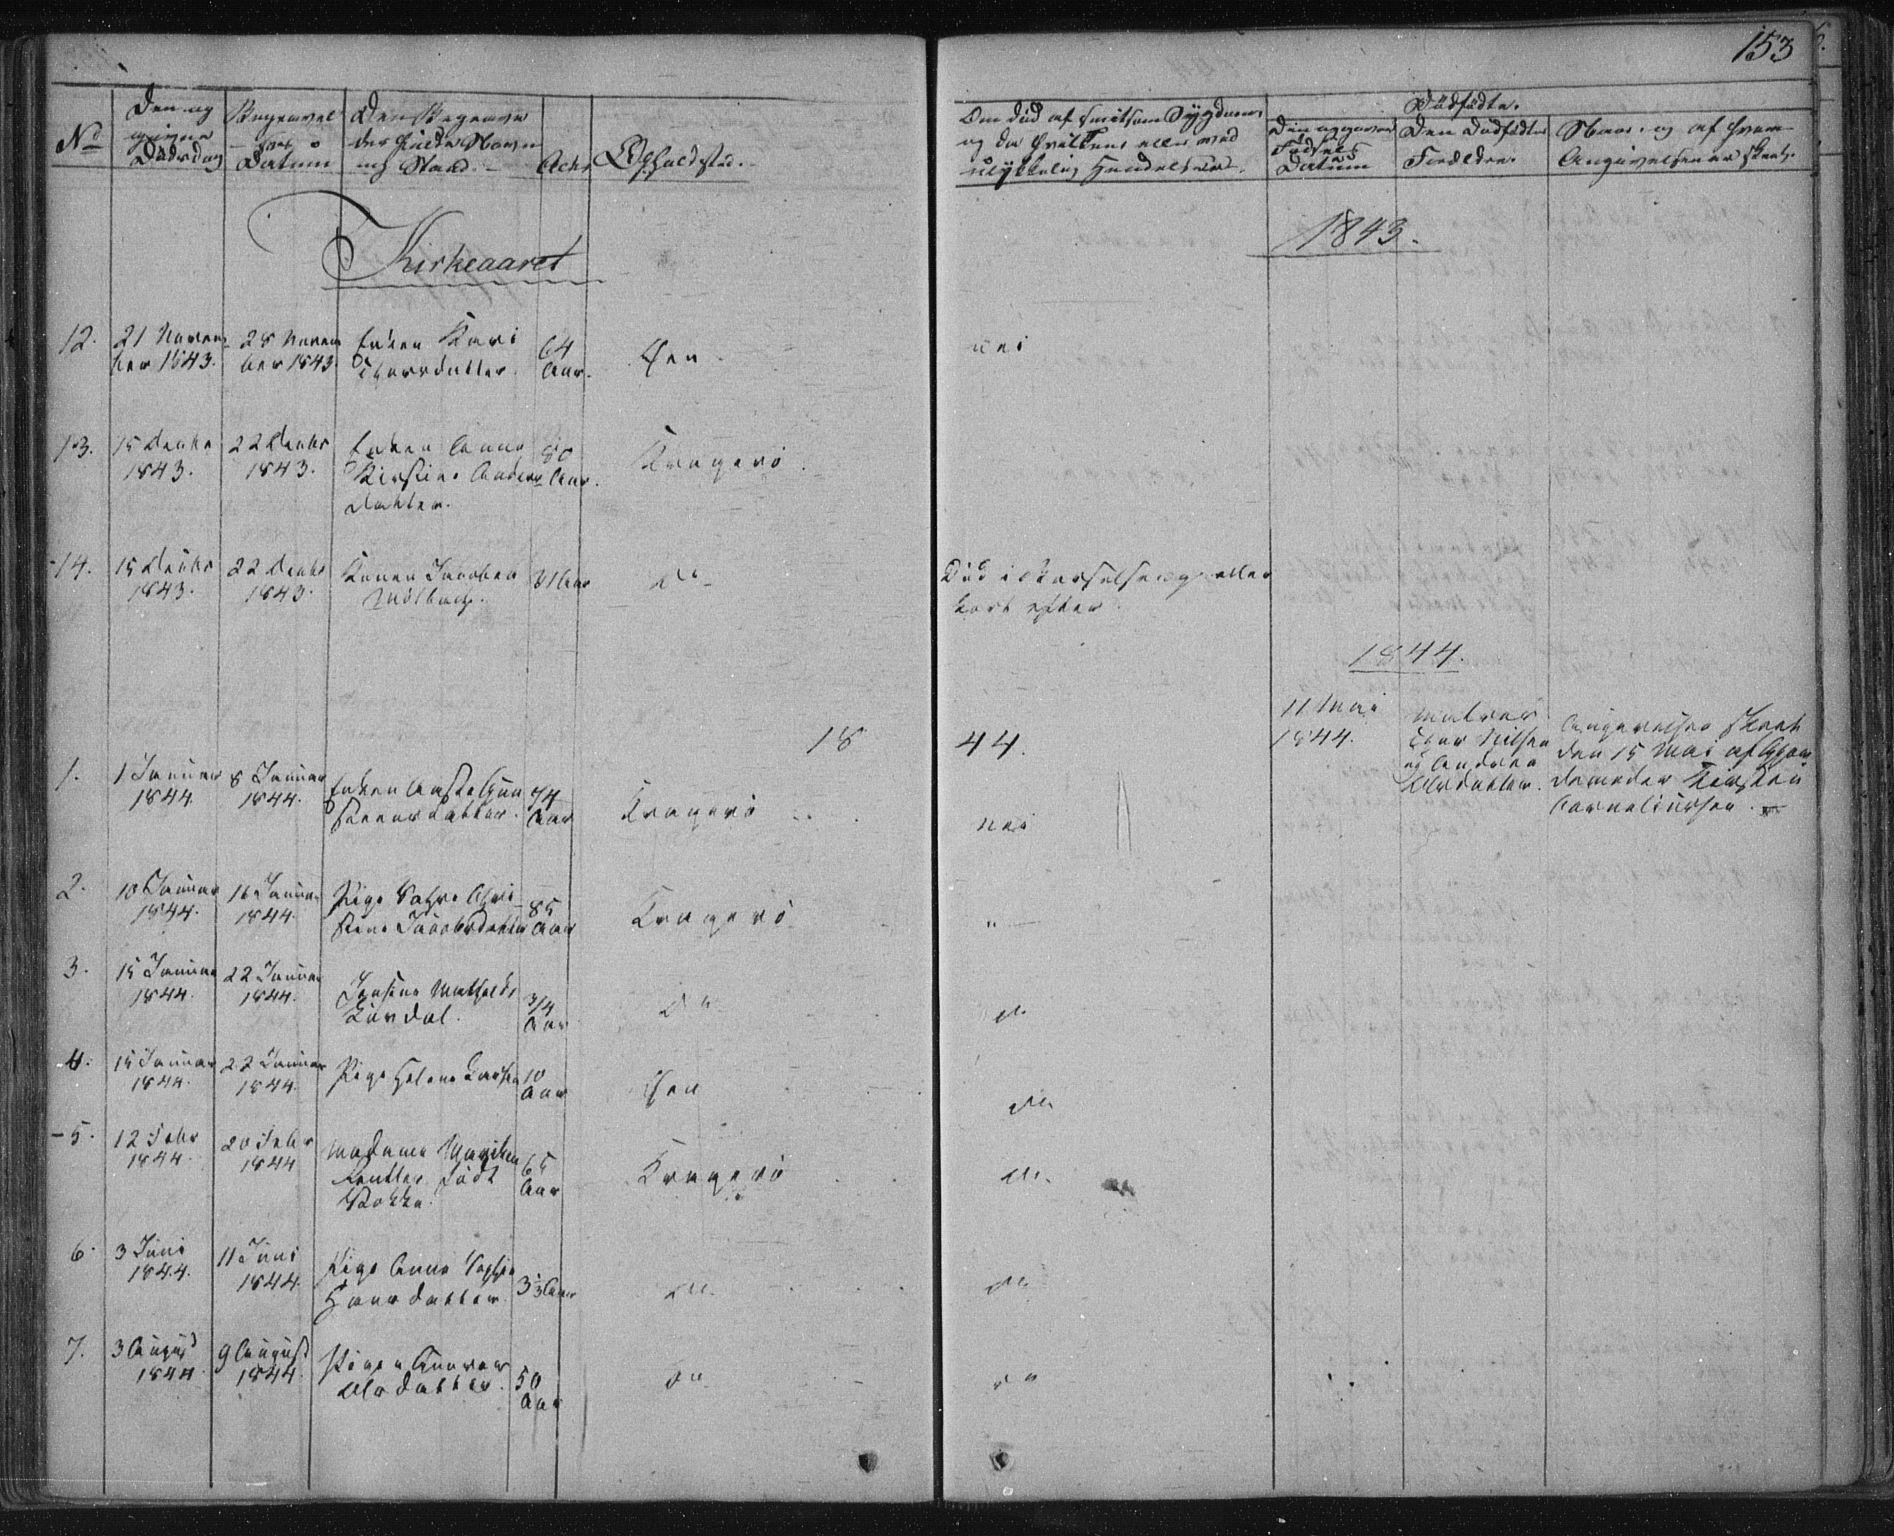 SAKO, Kragerø kirkebøker, F/Fa/L0005: Ministerialbok nr. 5, 1832-1847, s. 153